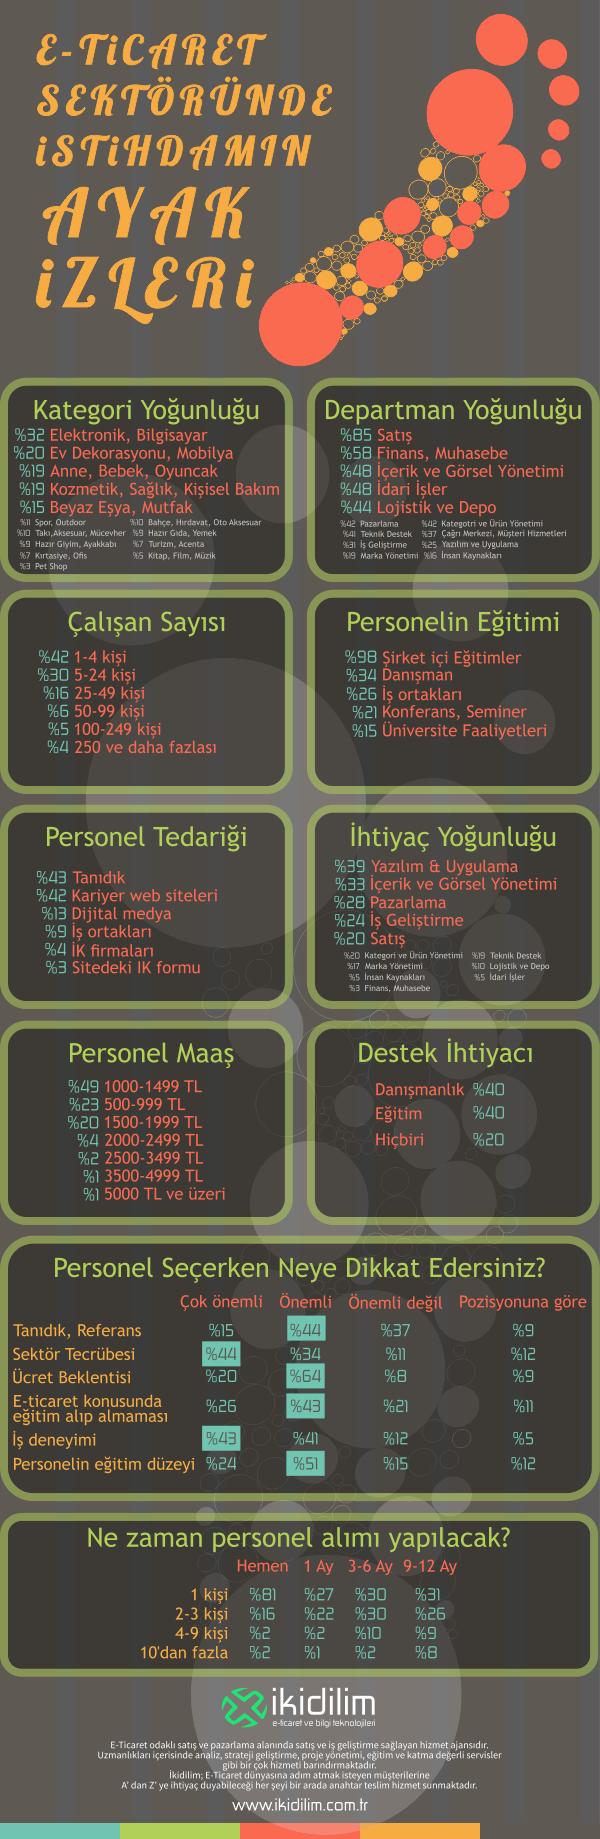 istihdam-grafik